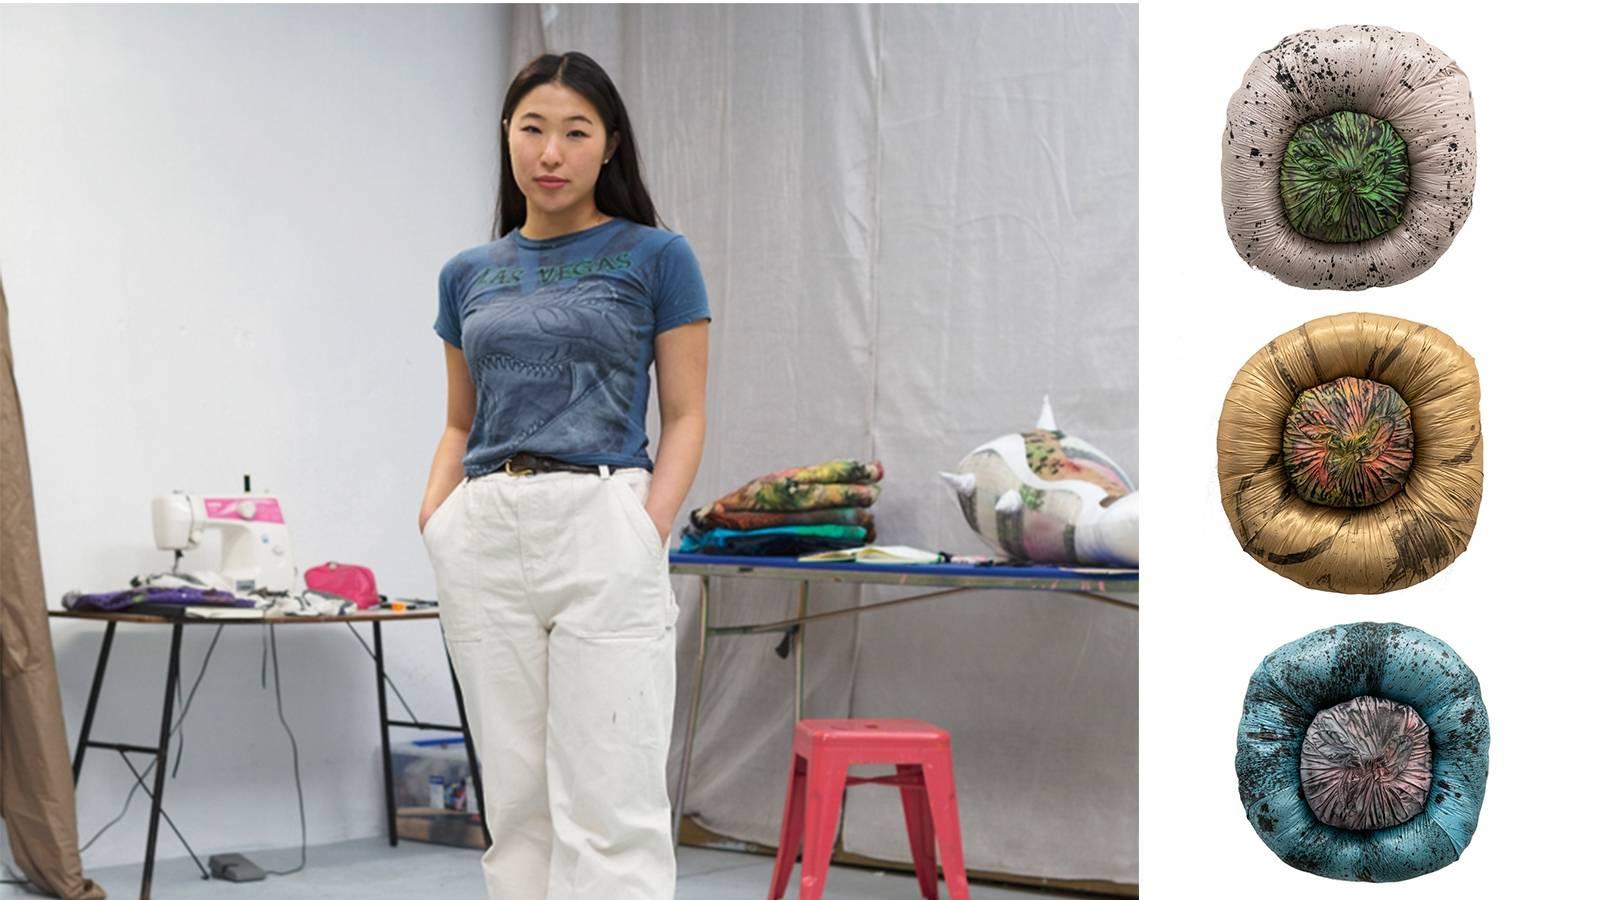 Meet the Maker: Korean New Zealand artist Emerita Baik